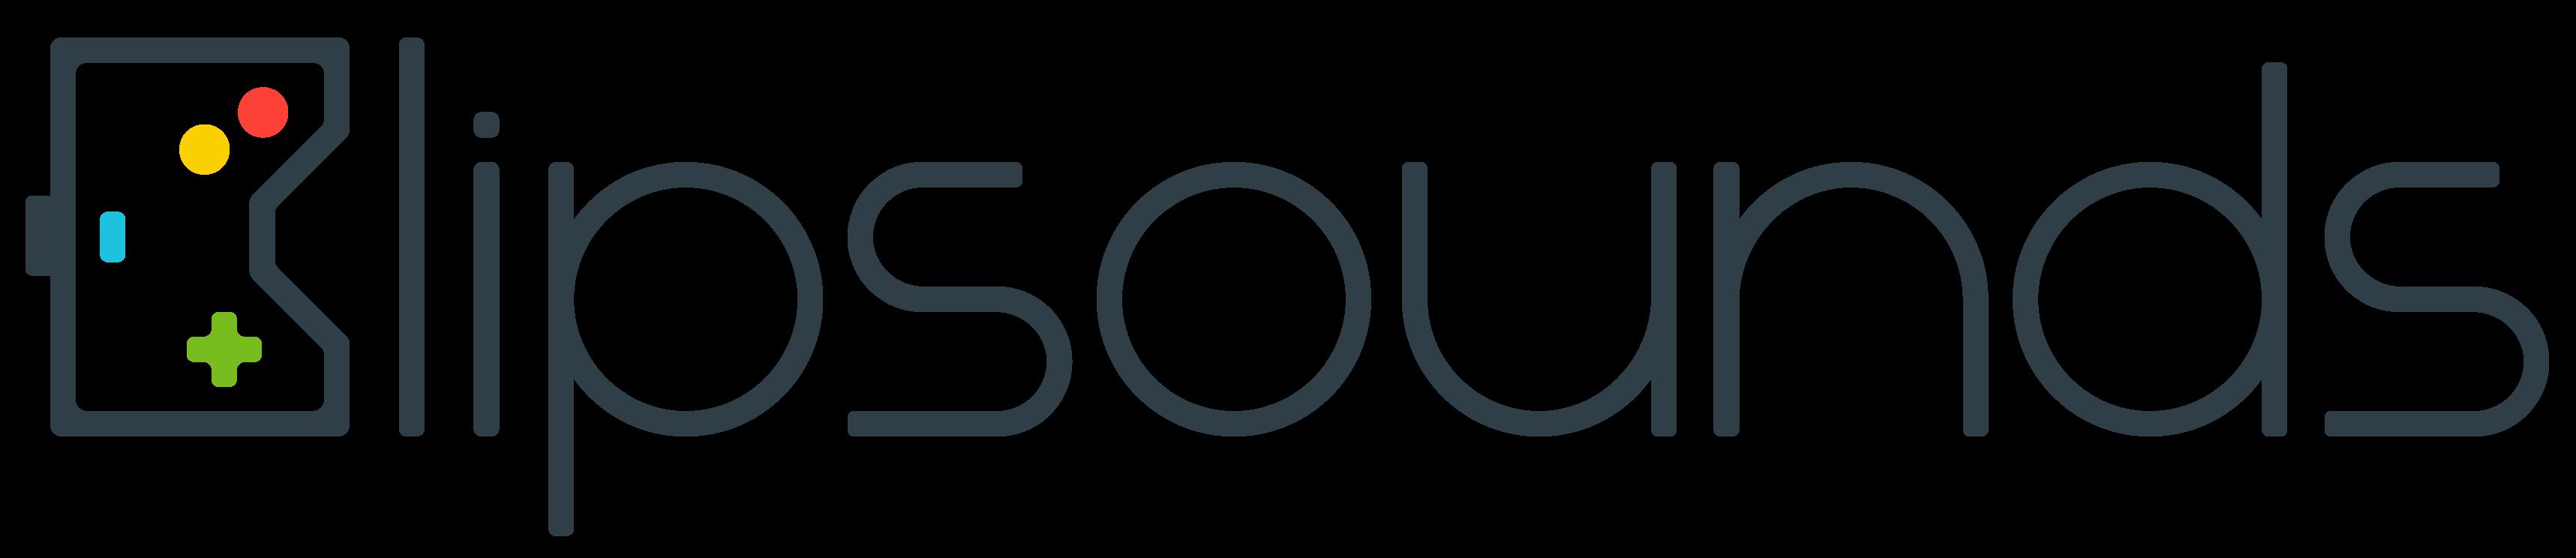 Blipsounds-Logo